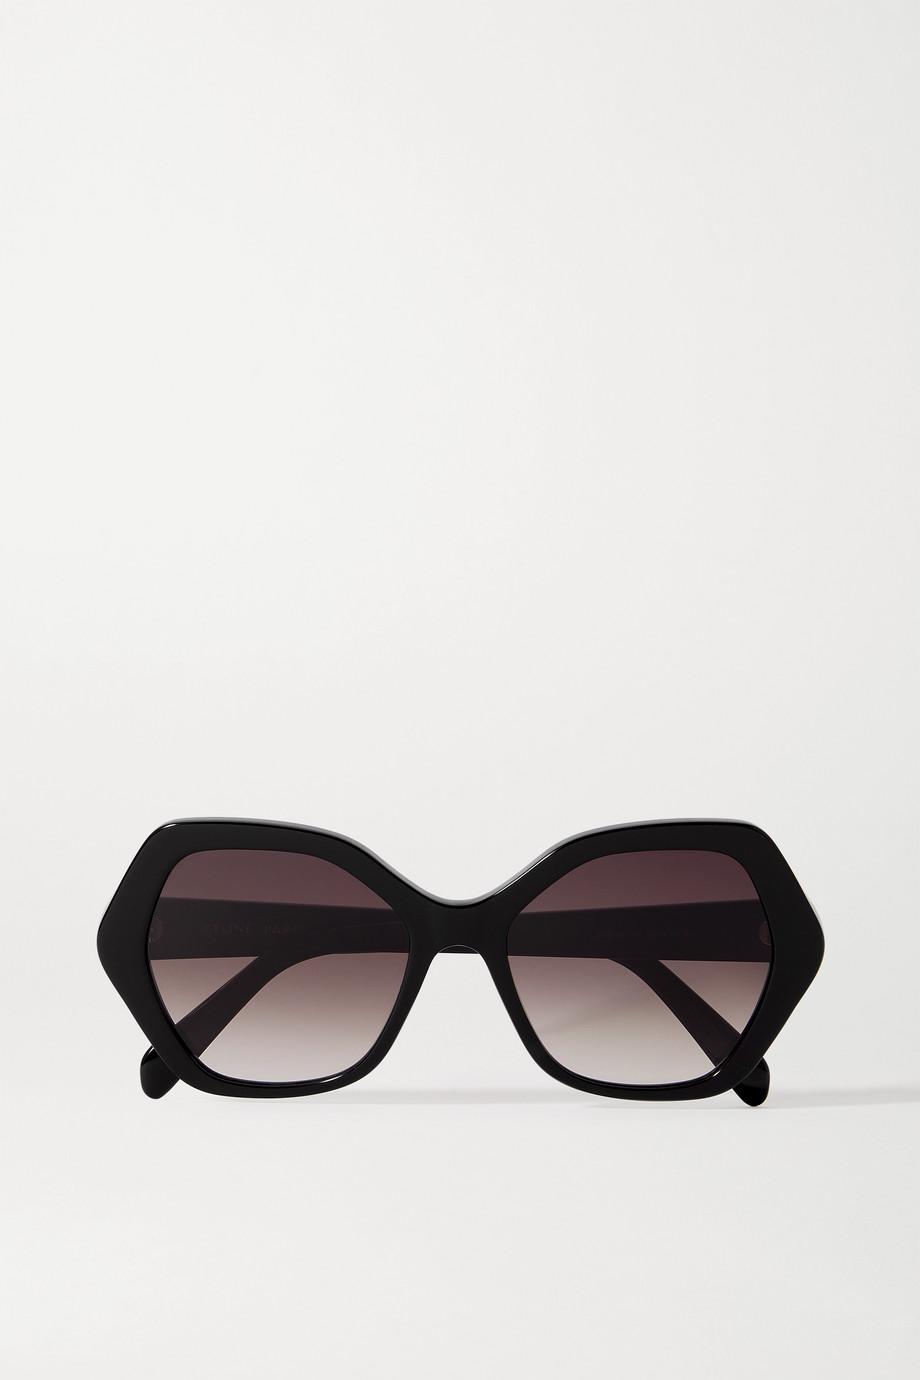 CELINE Eyewear Lunettes de soleil hexagonales en acétate